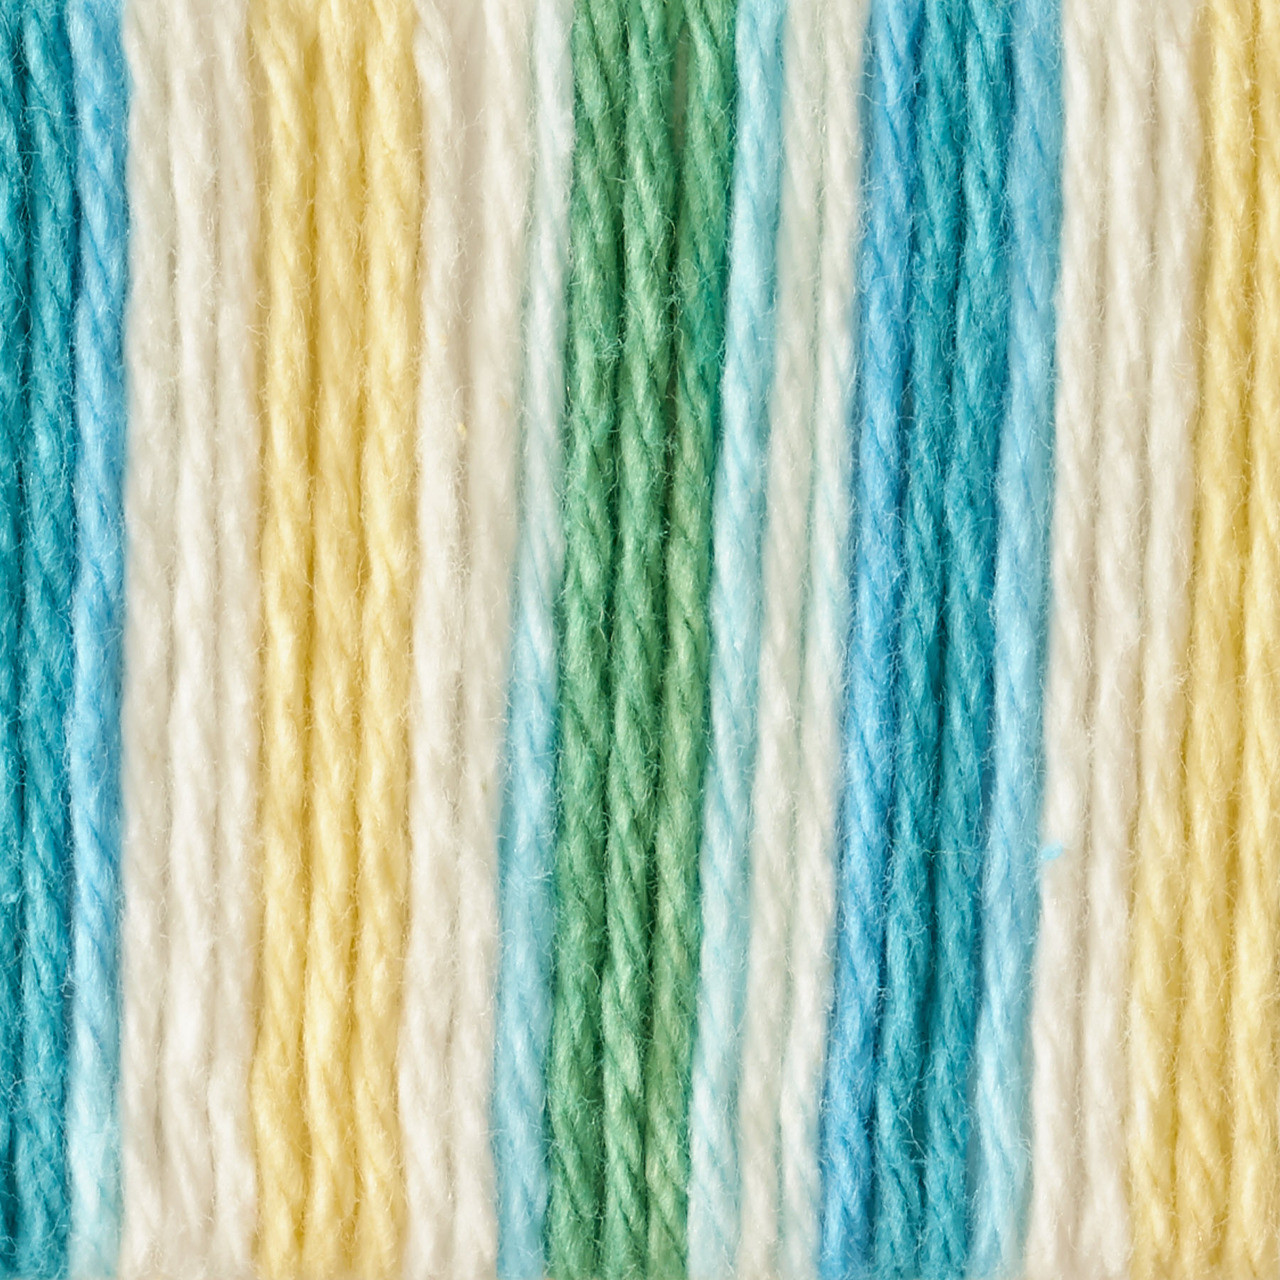 Bernat Mod Ombre Handicrafter Cotton Yarn 4 Medium